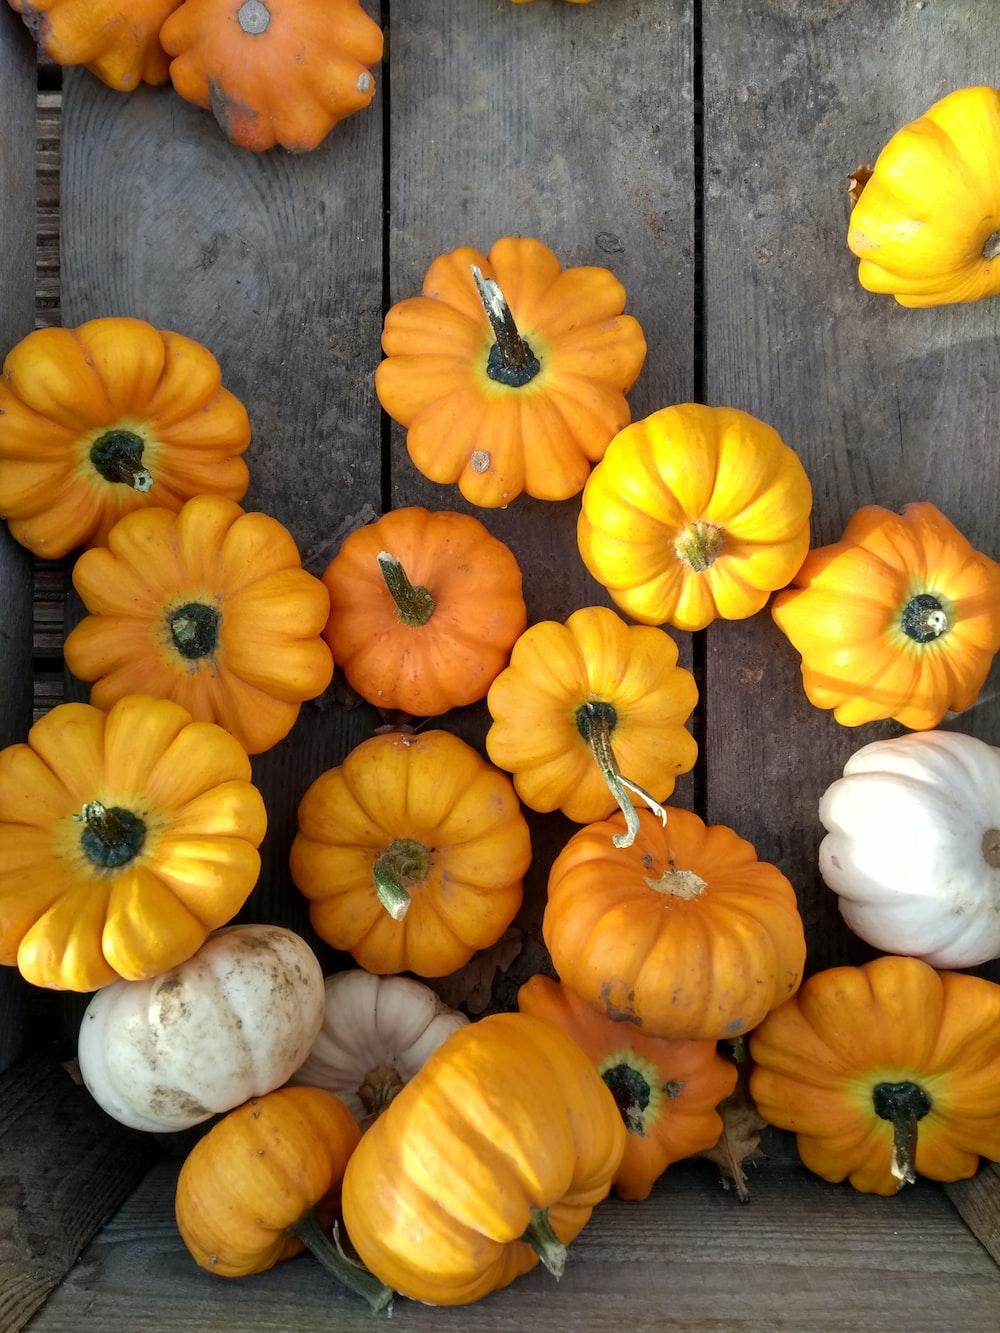 artificial pumpkins inside crate